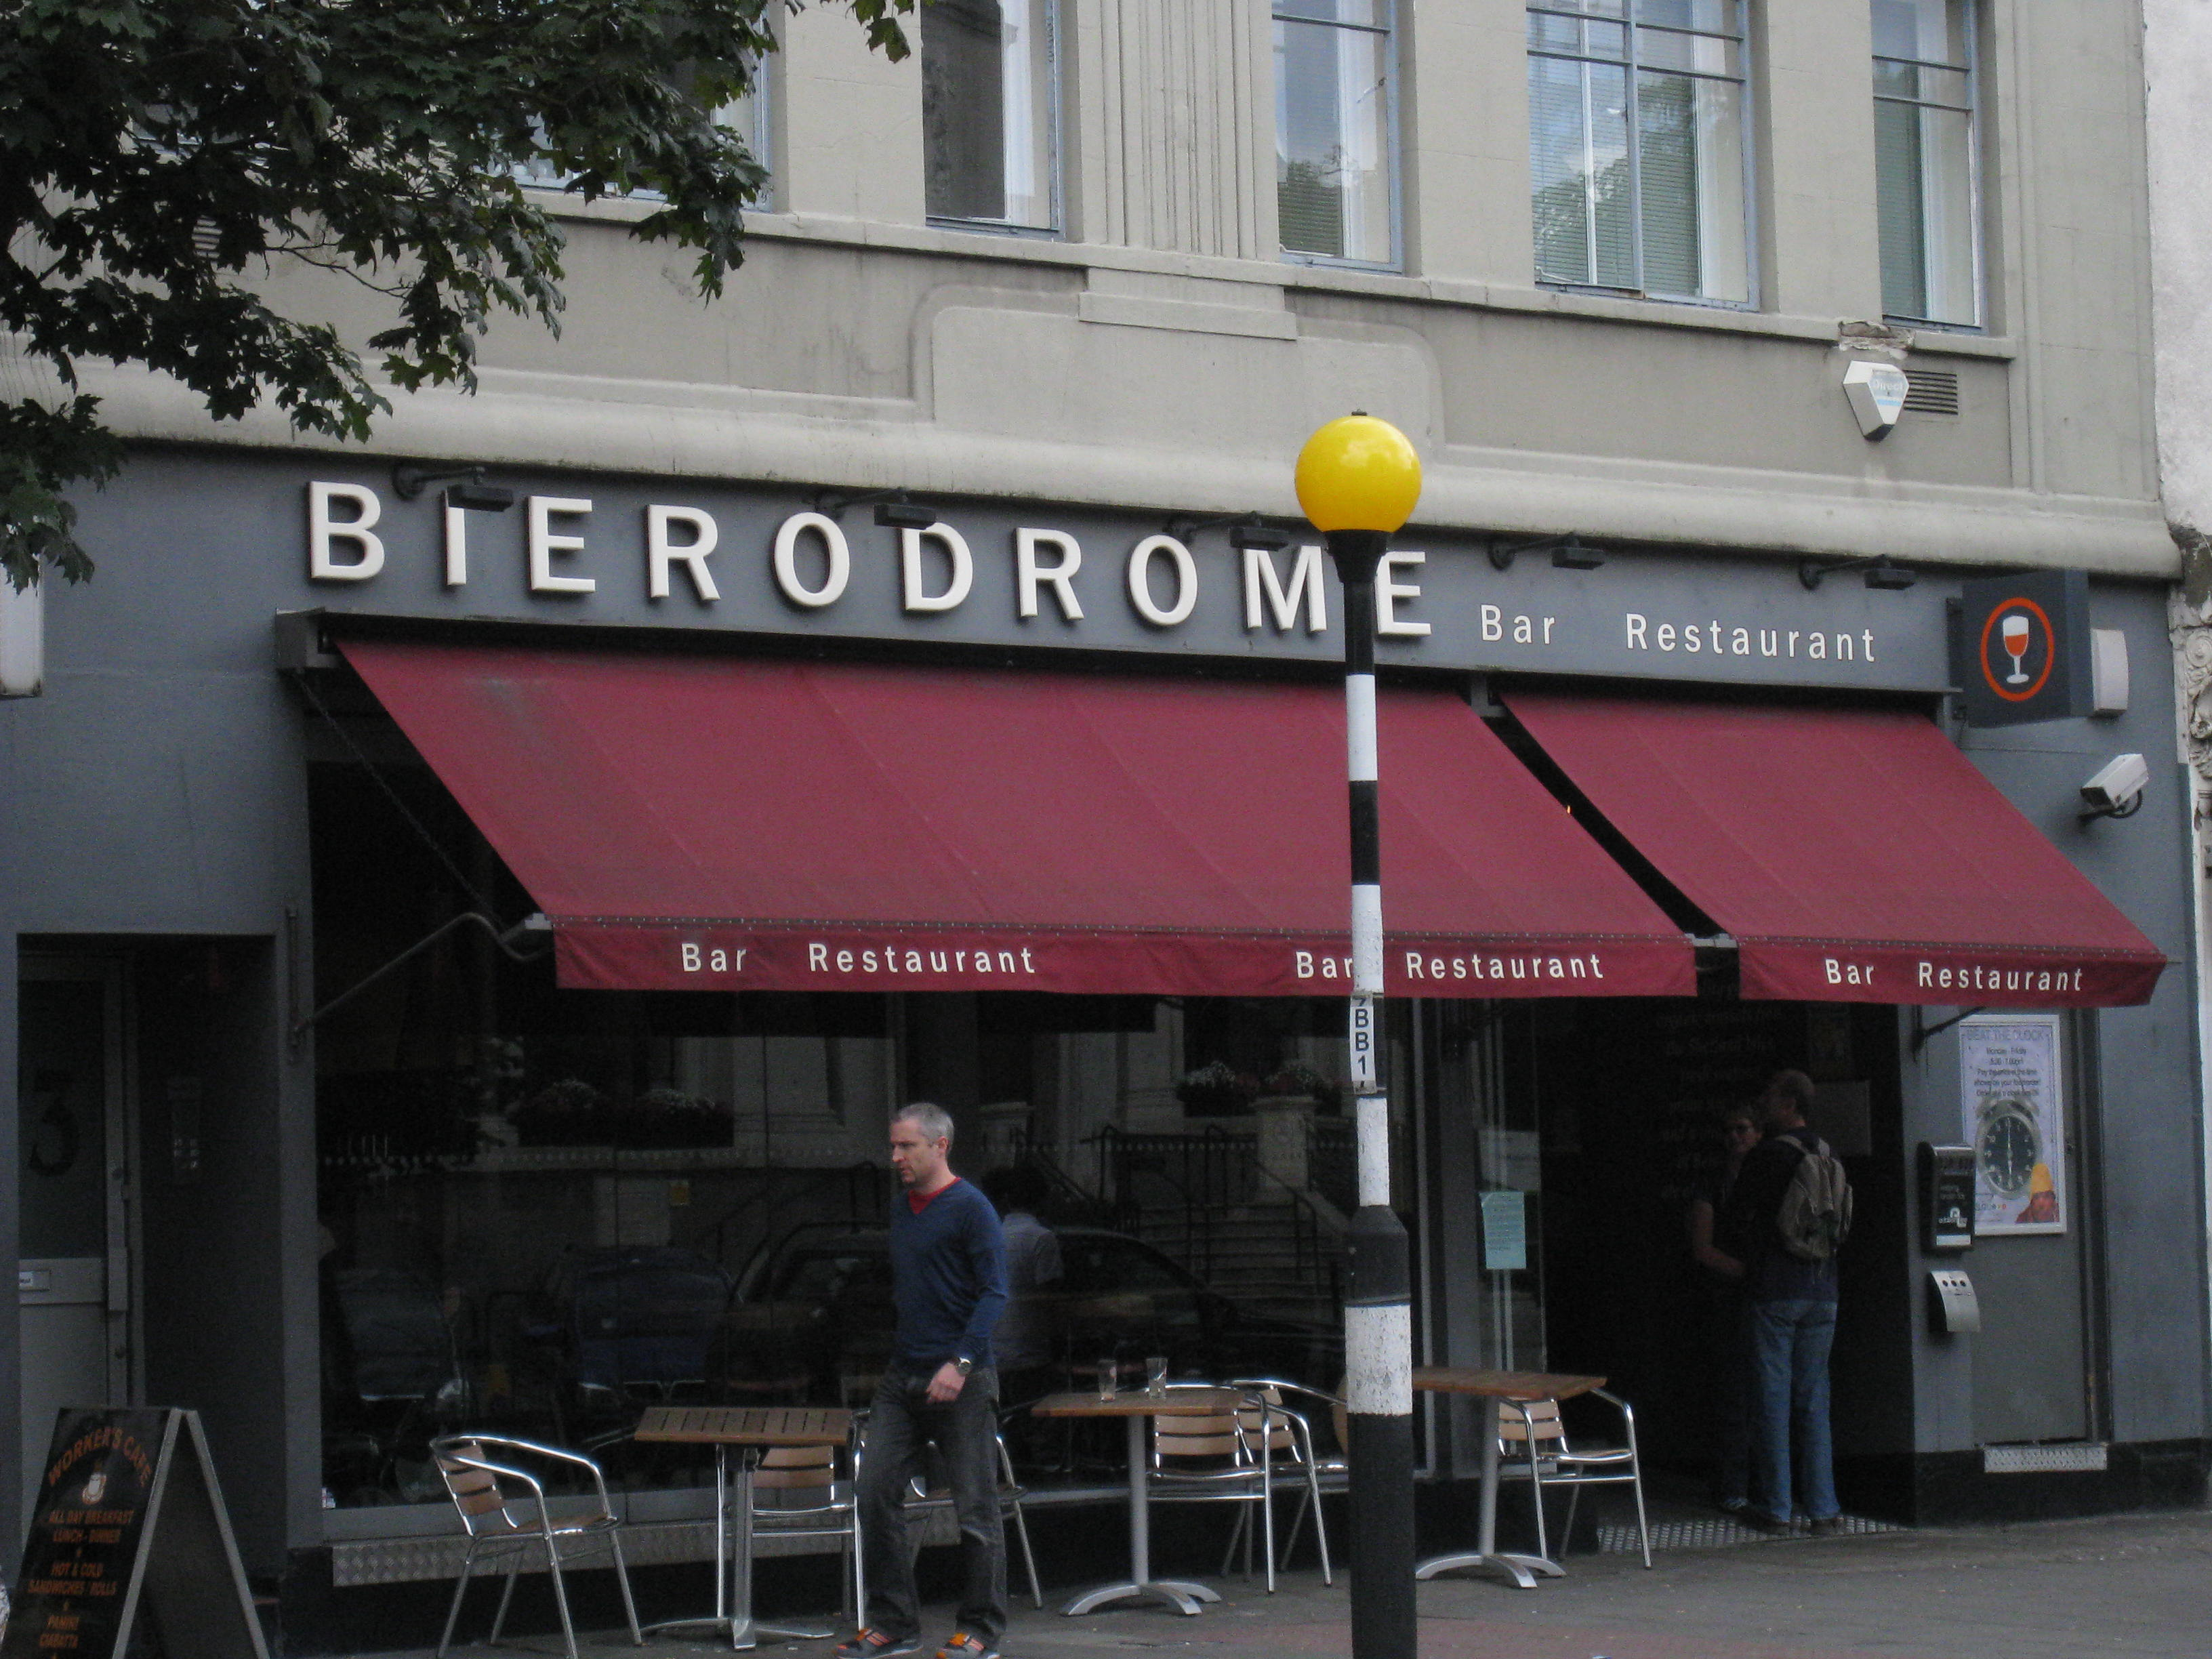 Bierodrome - CLOSED London